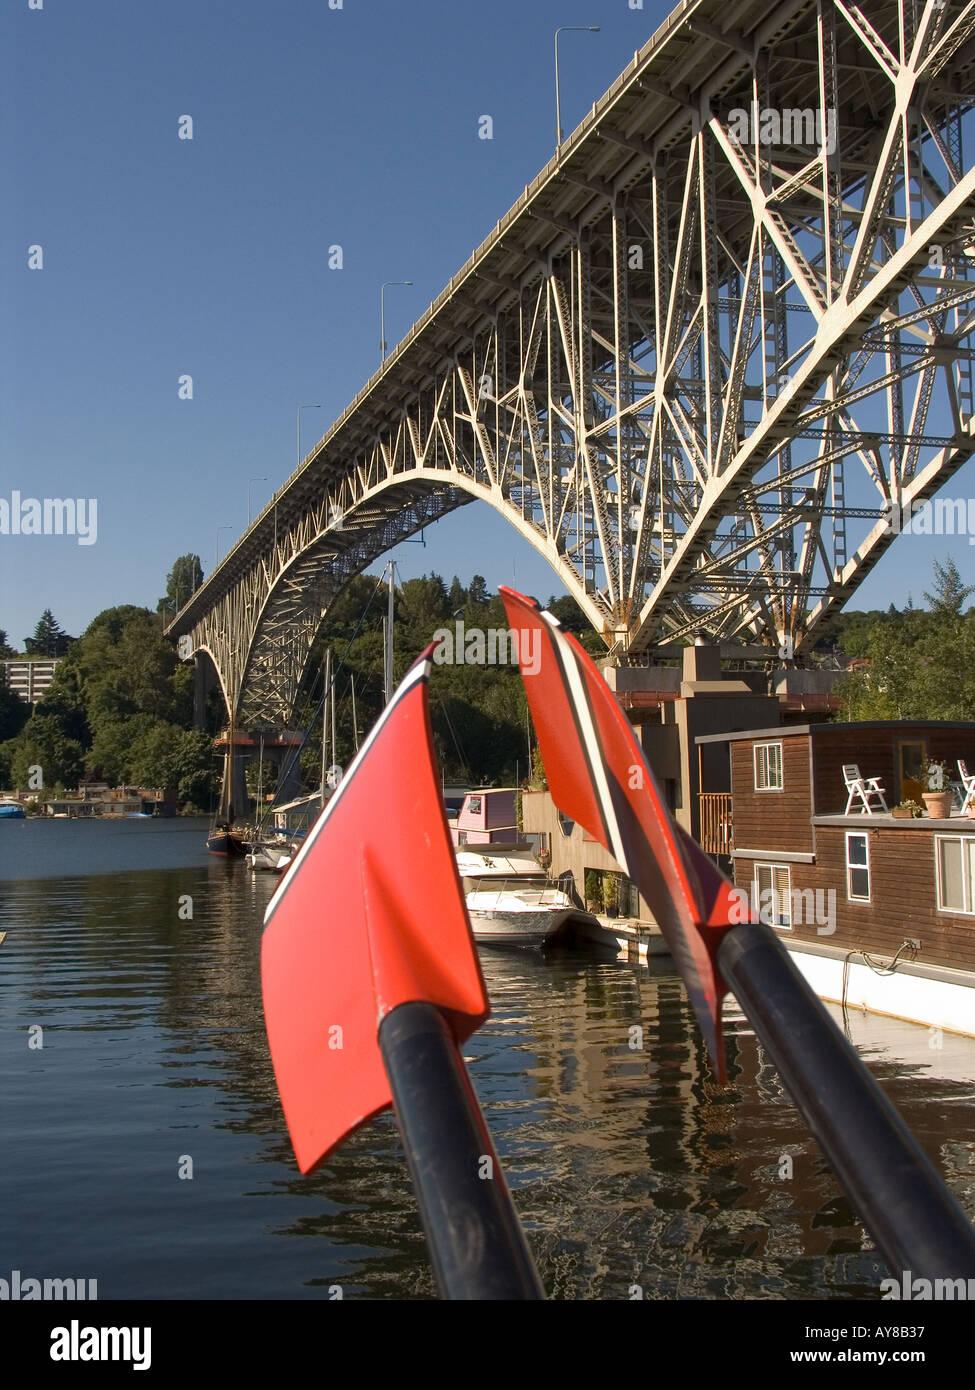 Red tipped skulling oars Aurora Bridge marina with sailboat and houseboat moorage on north shore of Lake Union Seattle Washi - Stock Image